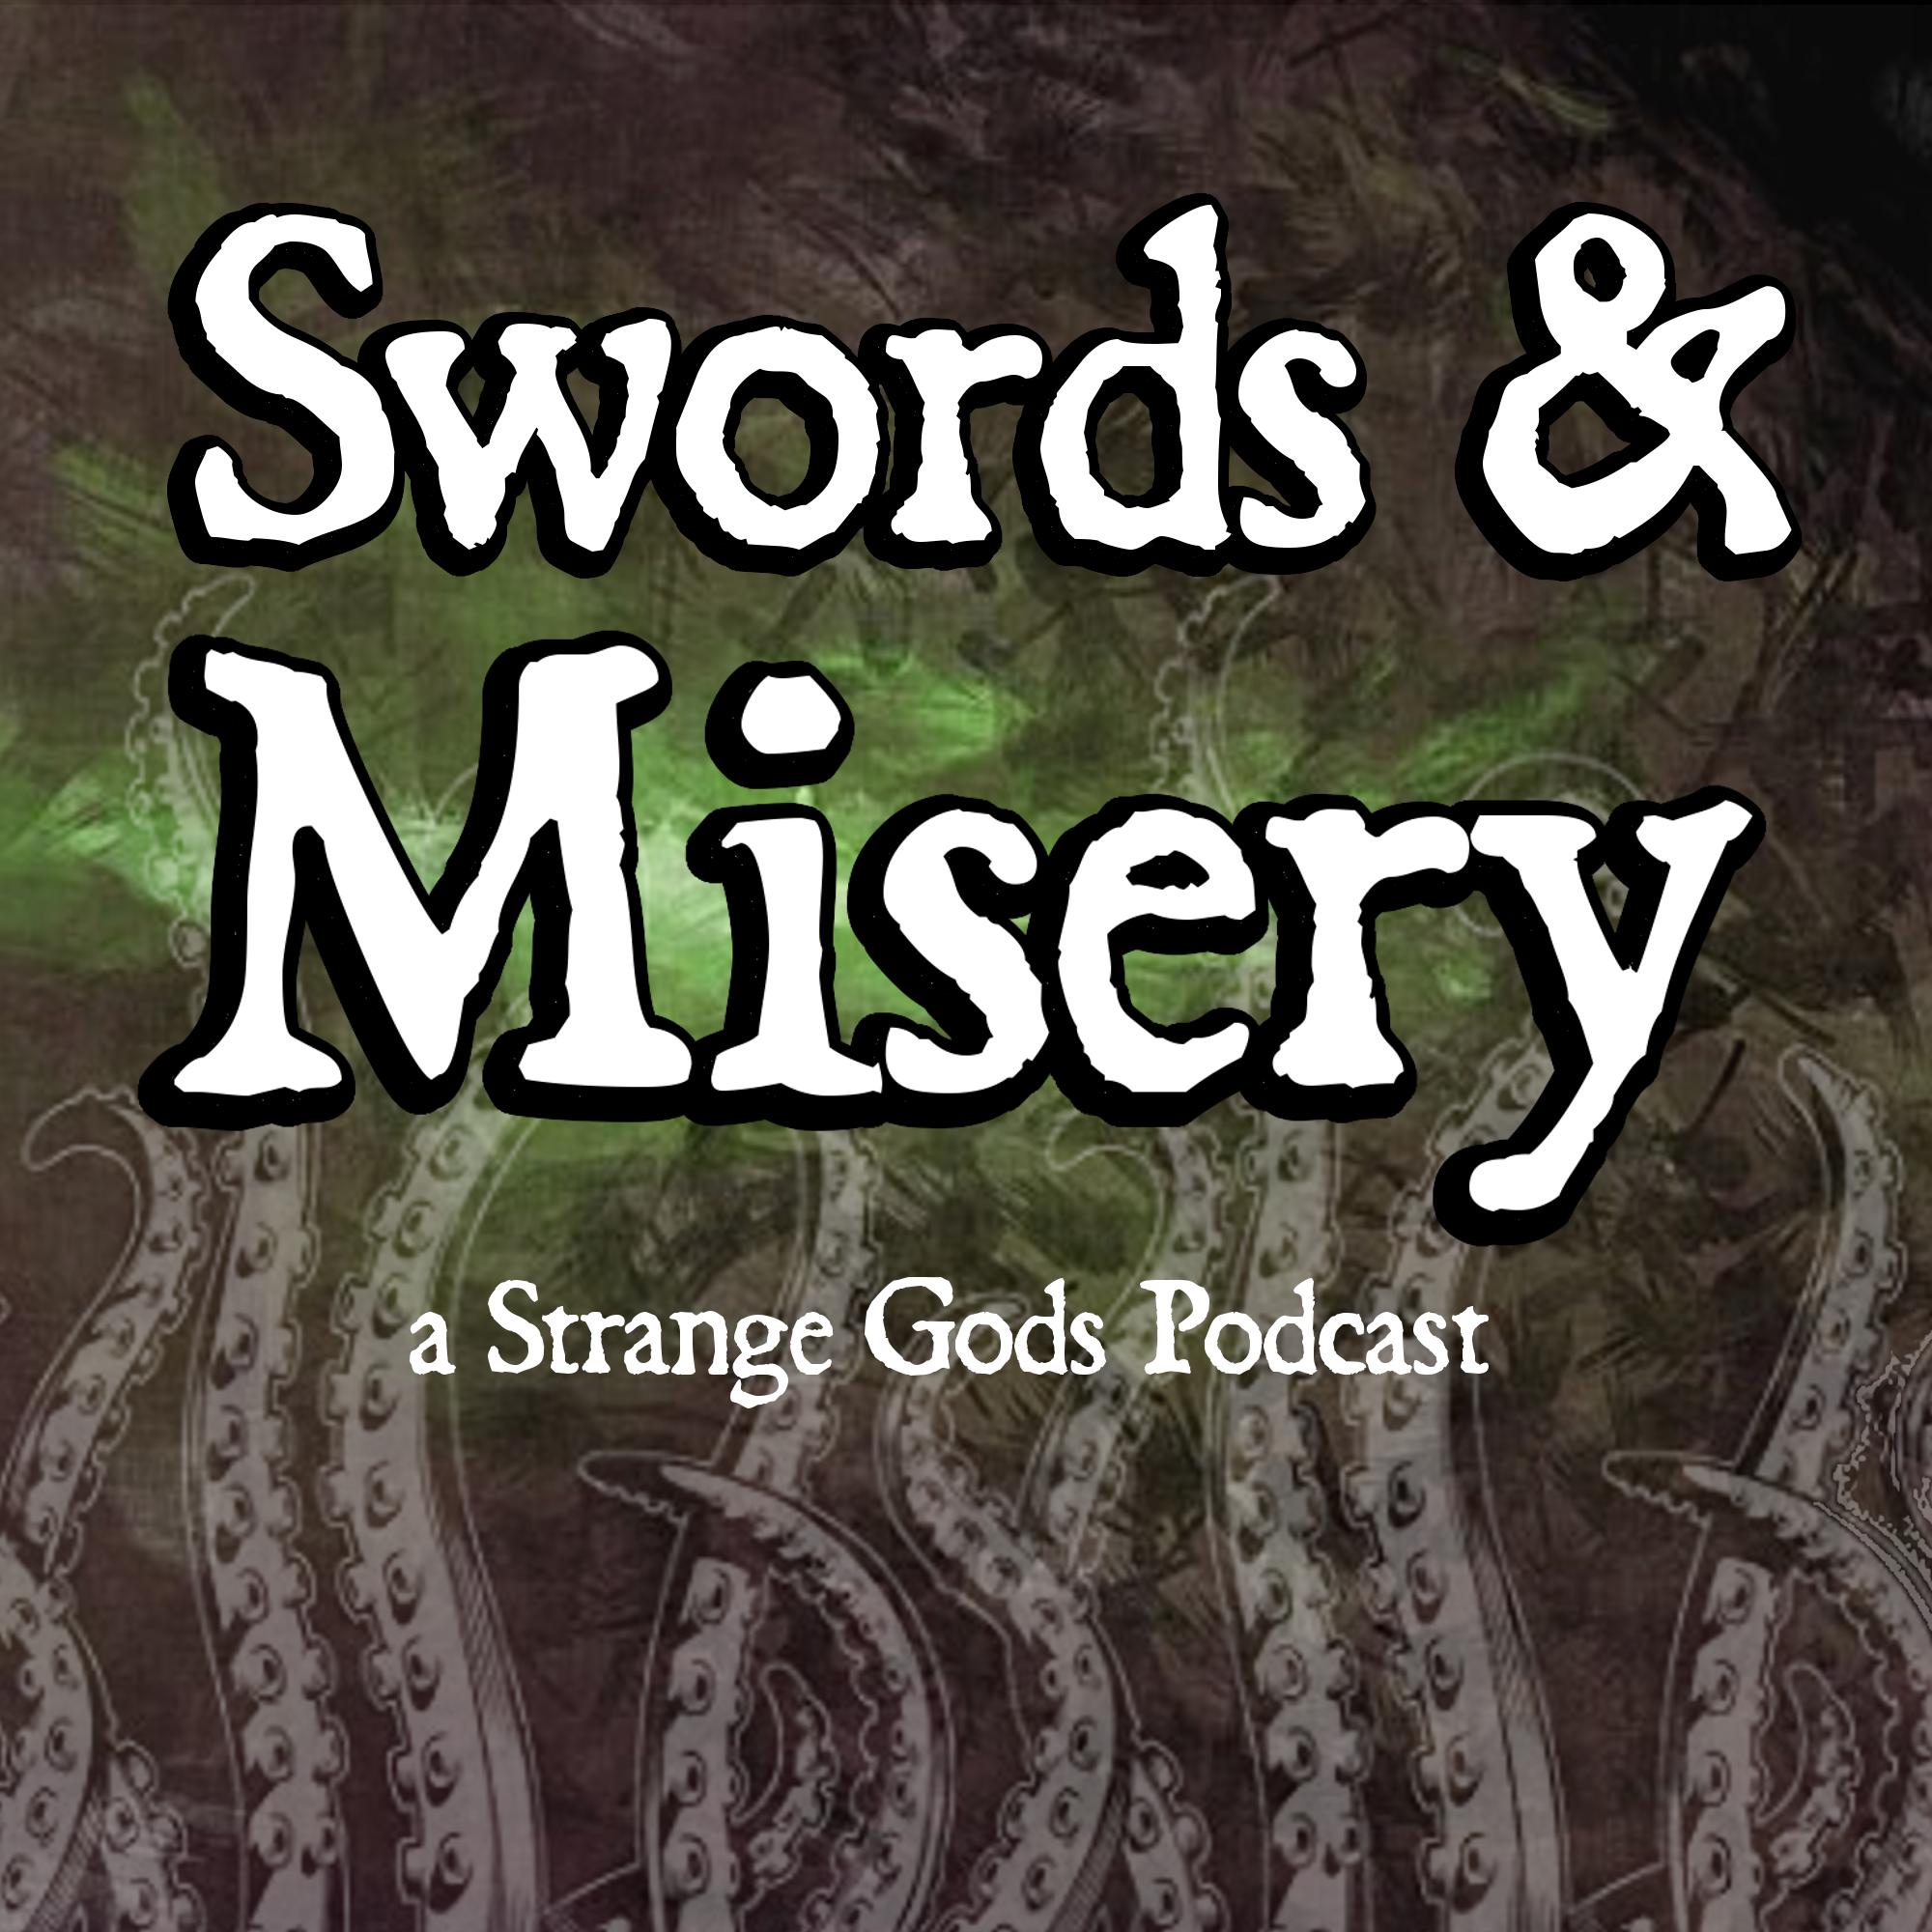 Swords & Misery show art